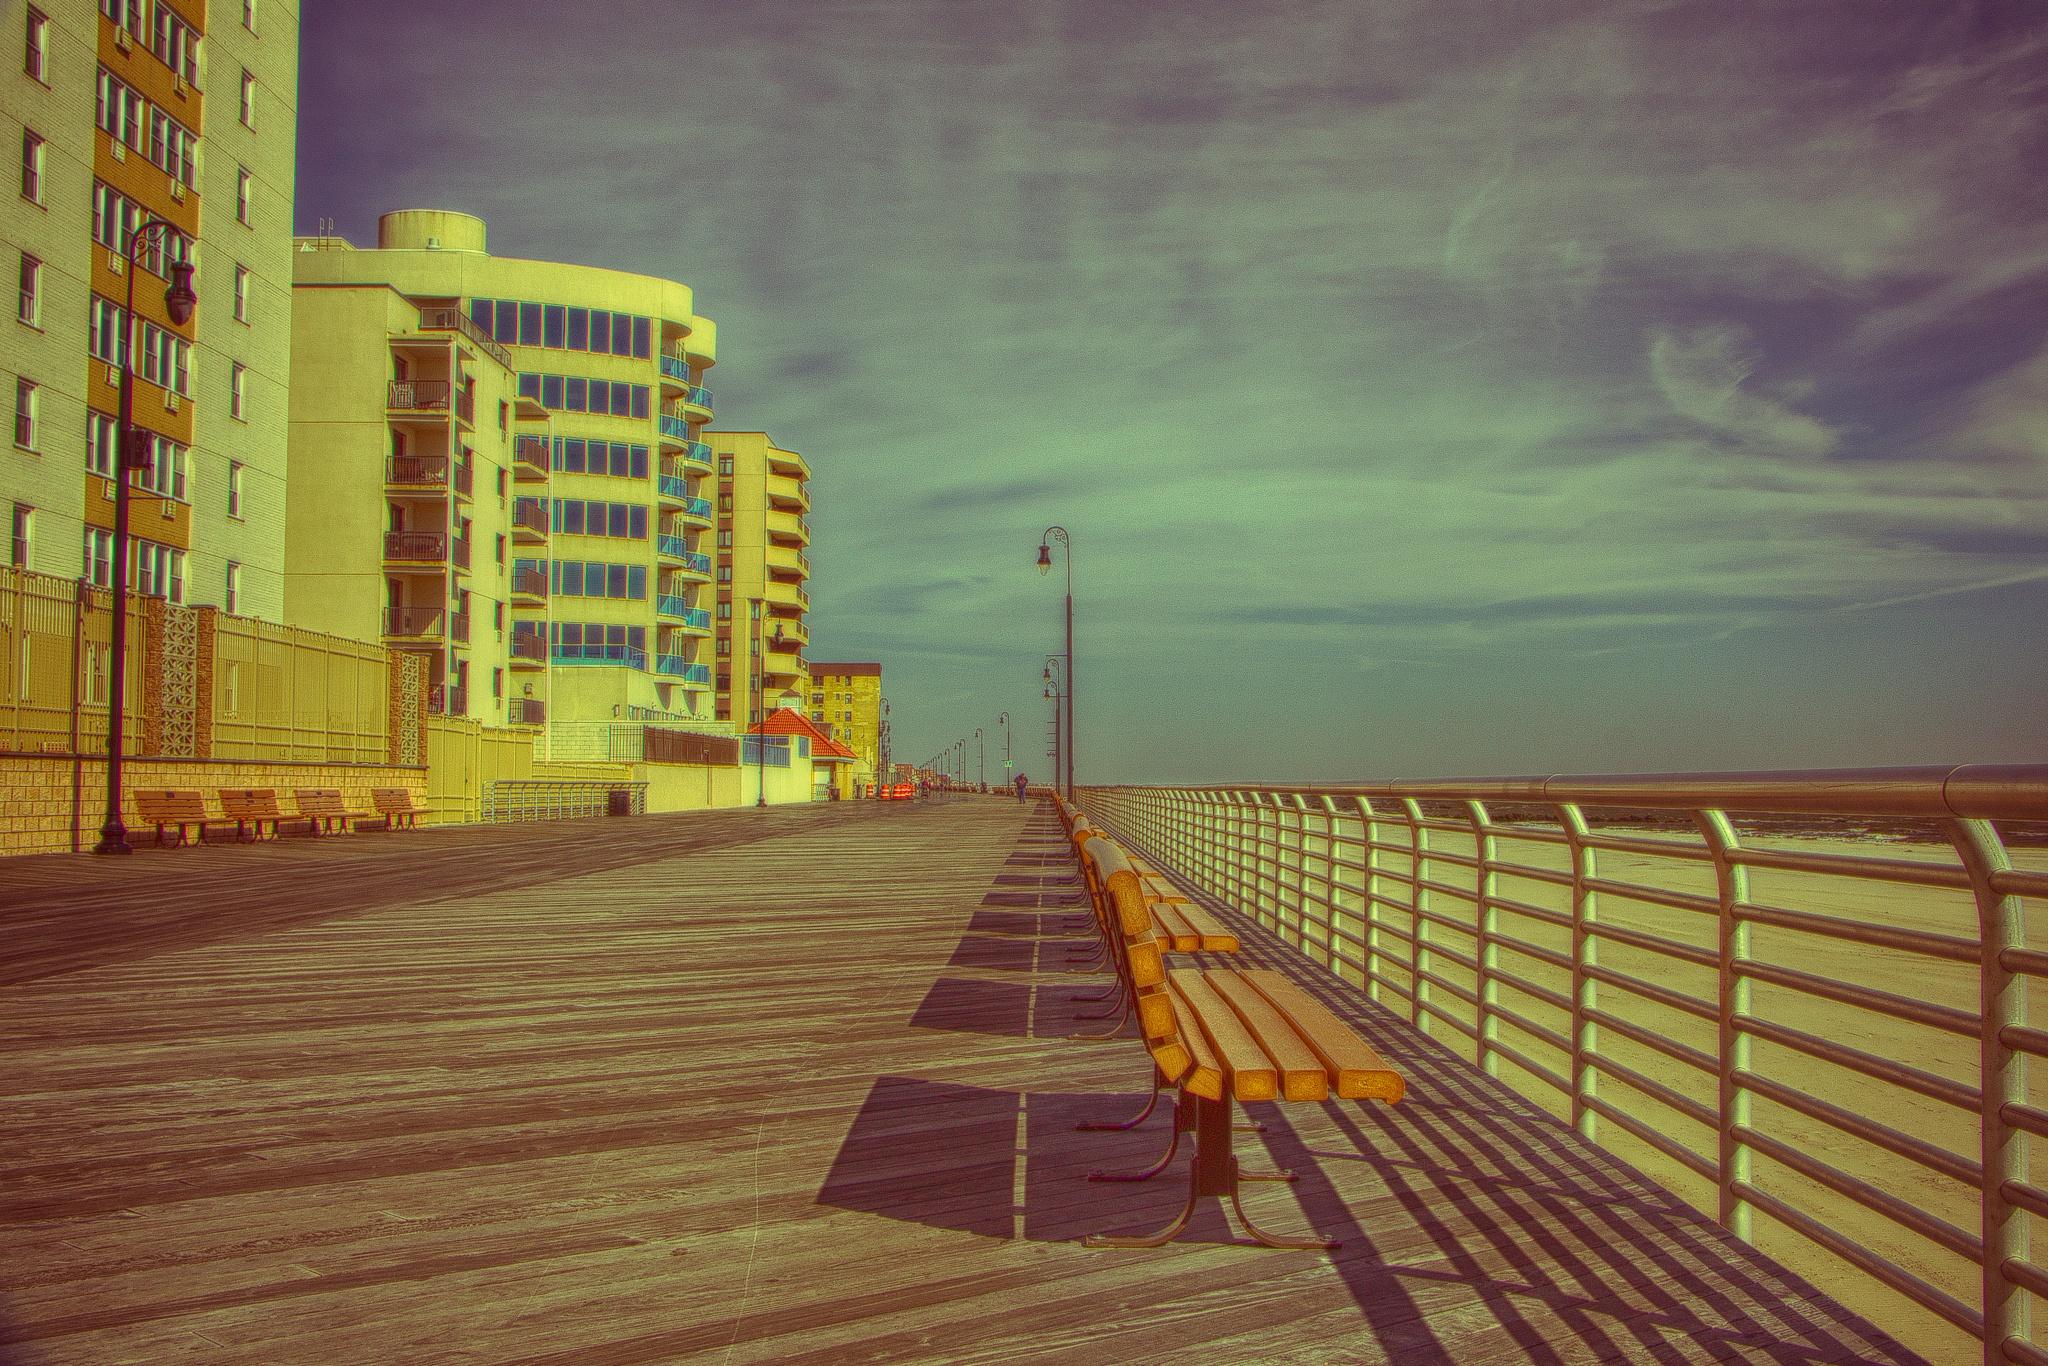 boardwalk, Long Beach NY by joseph.gioglio